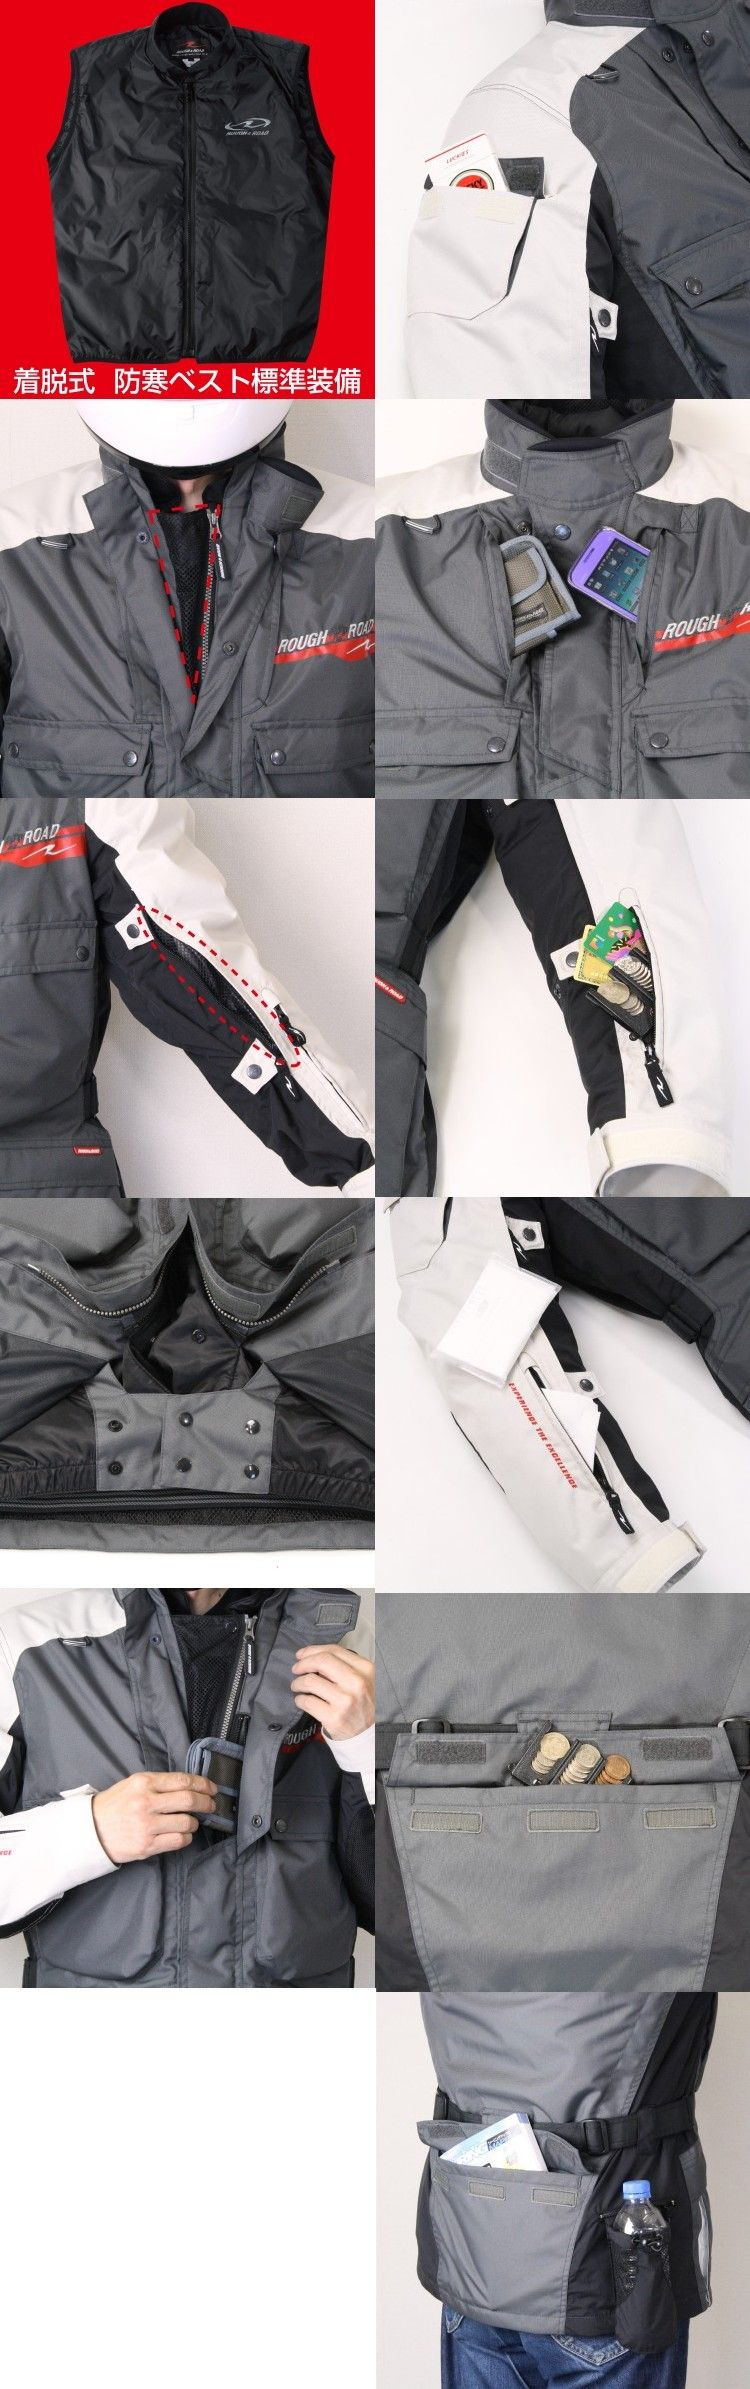 【ROUGH&ROAD】SSF旅行外套 - 「Webike-摩托百貨」